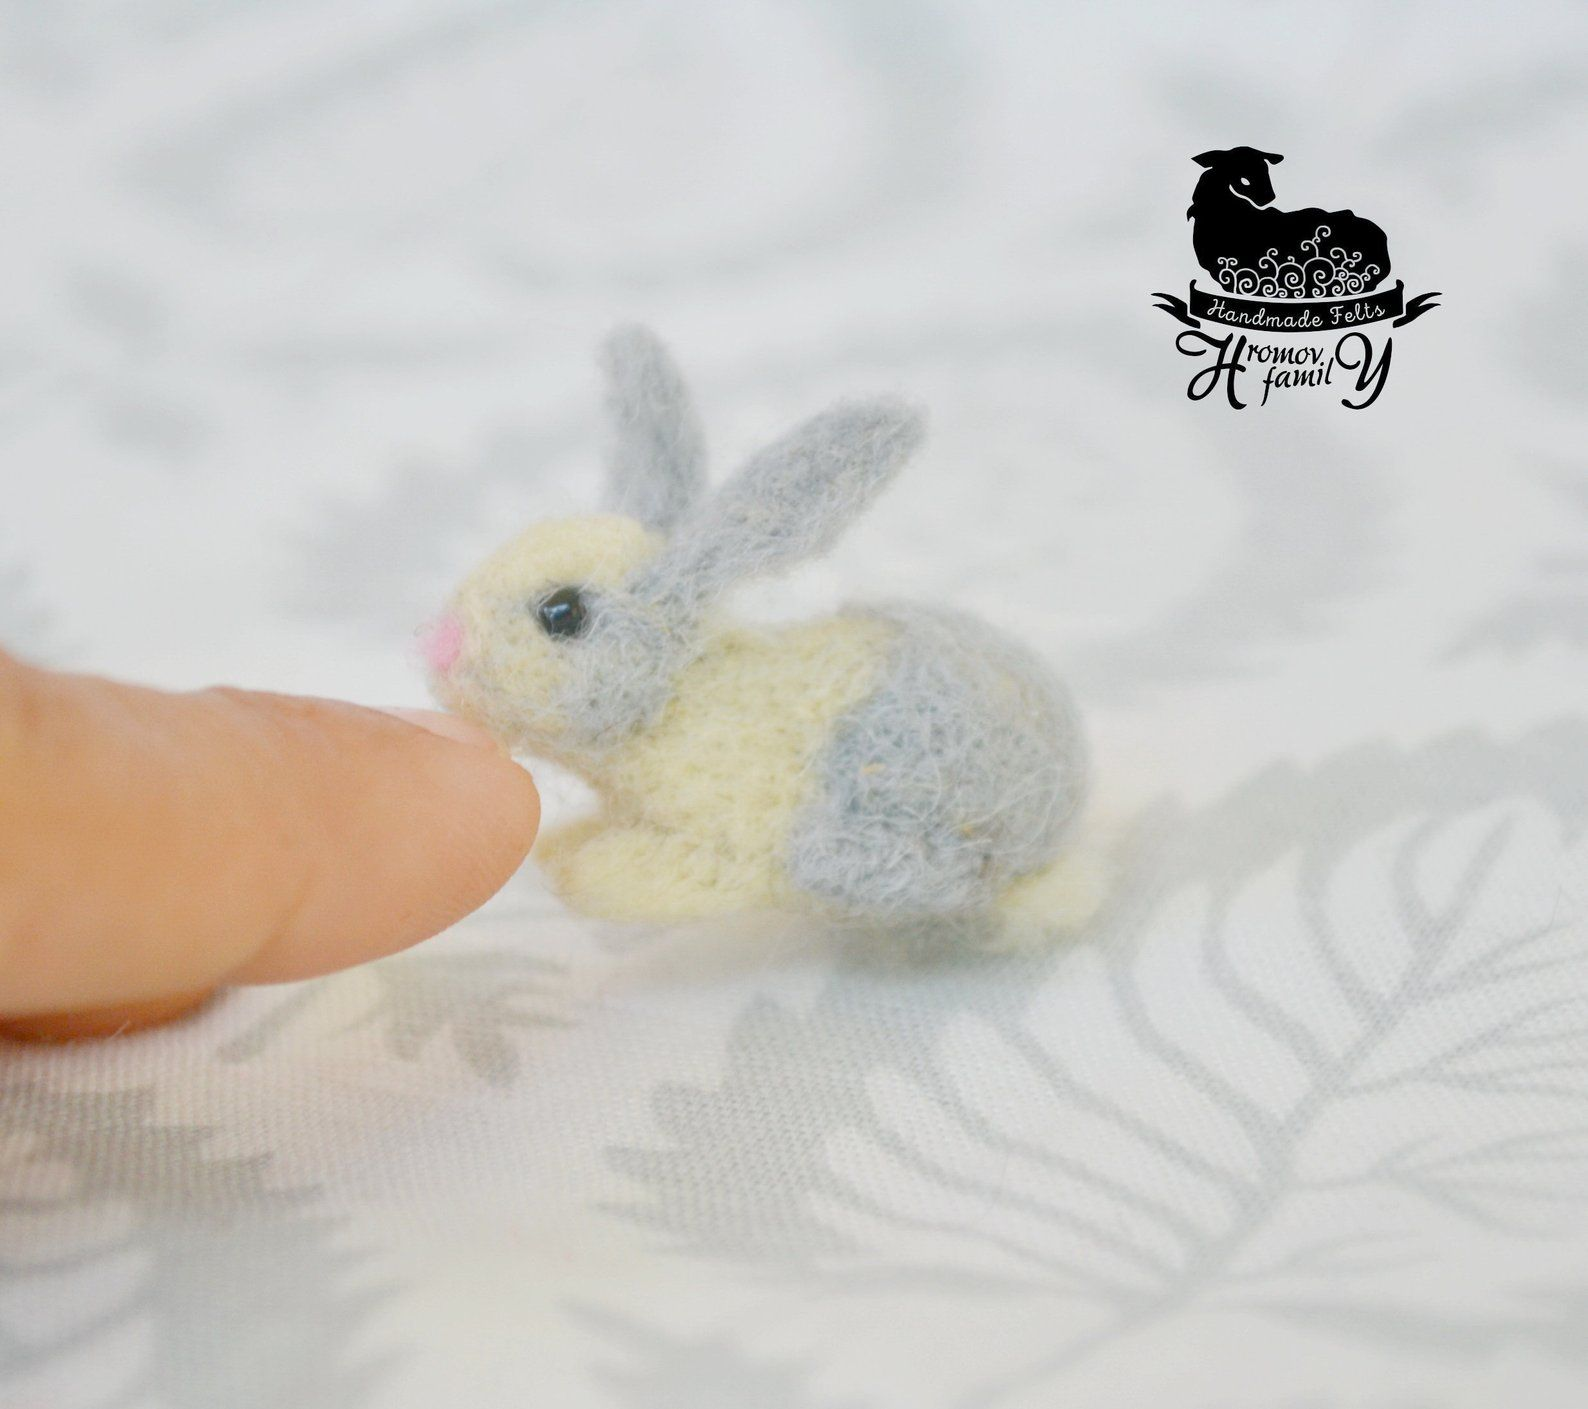 Winzige Grаy Bunny, nadelgefilzt kleine Haustier, Rabit